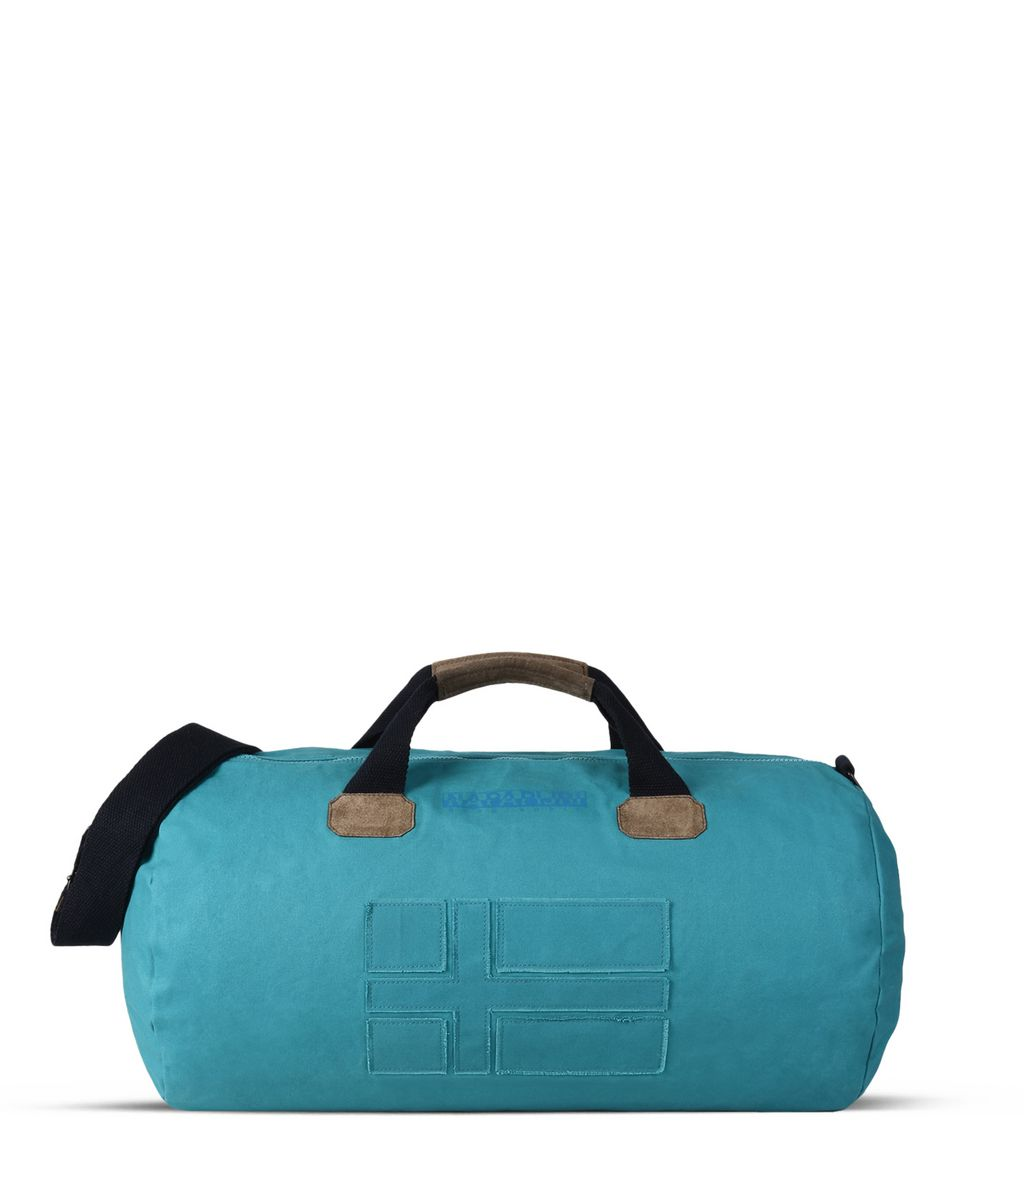 NAPAPIJRI HERMITAGE Travel Bag E f